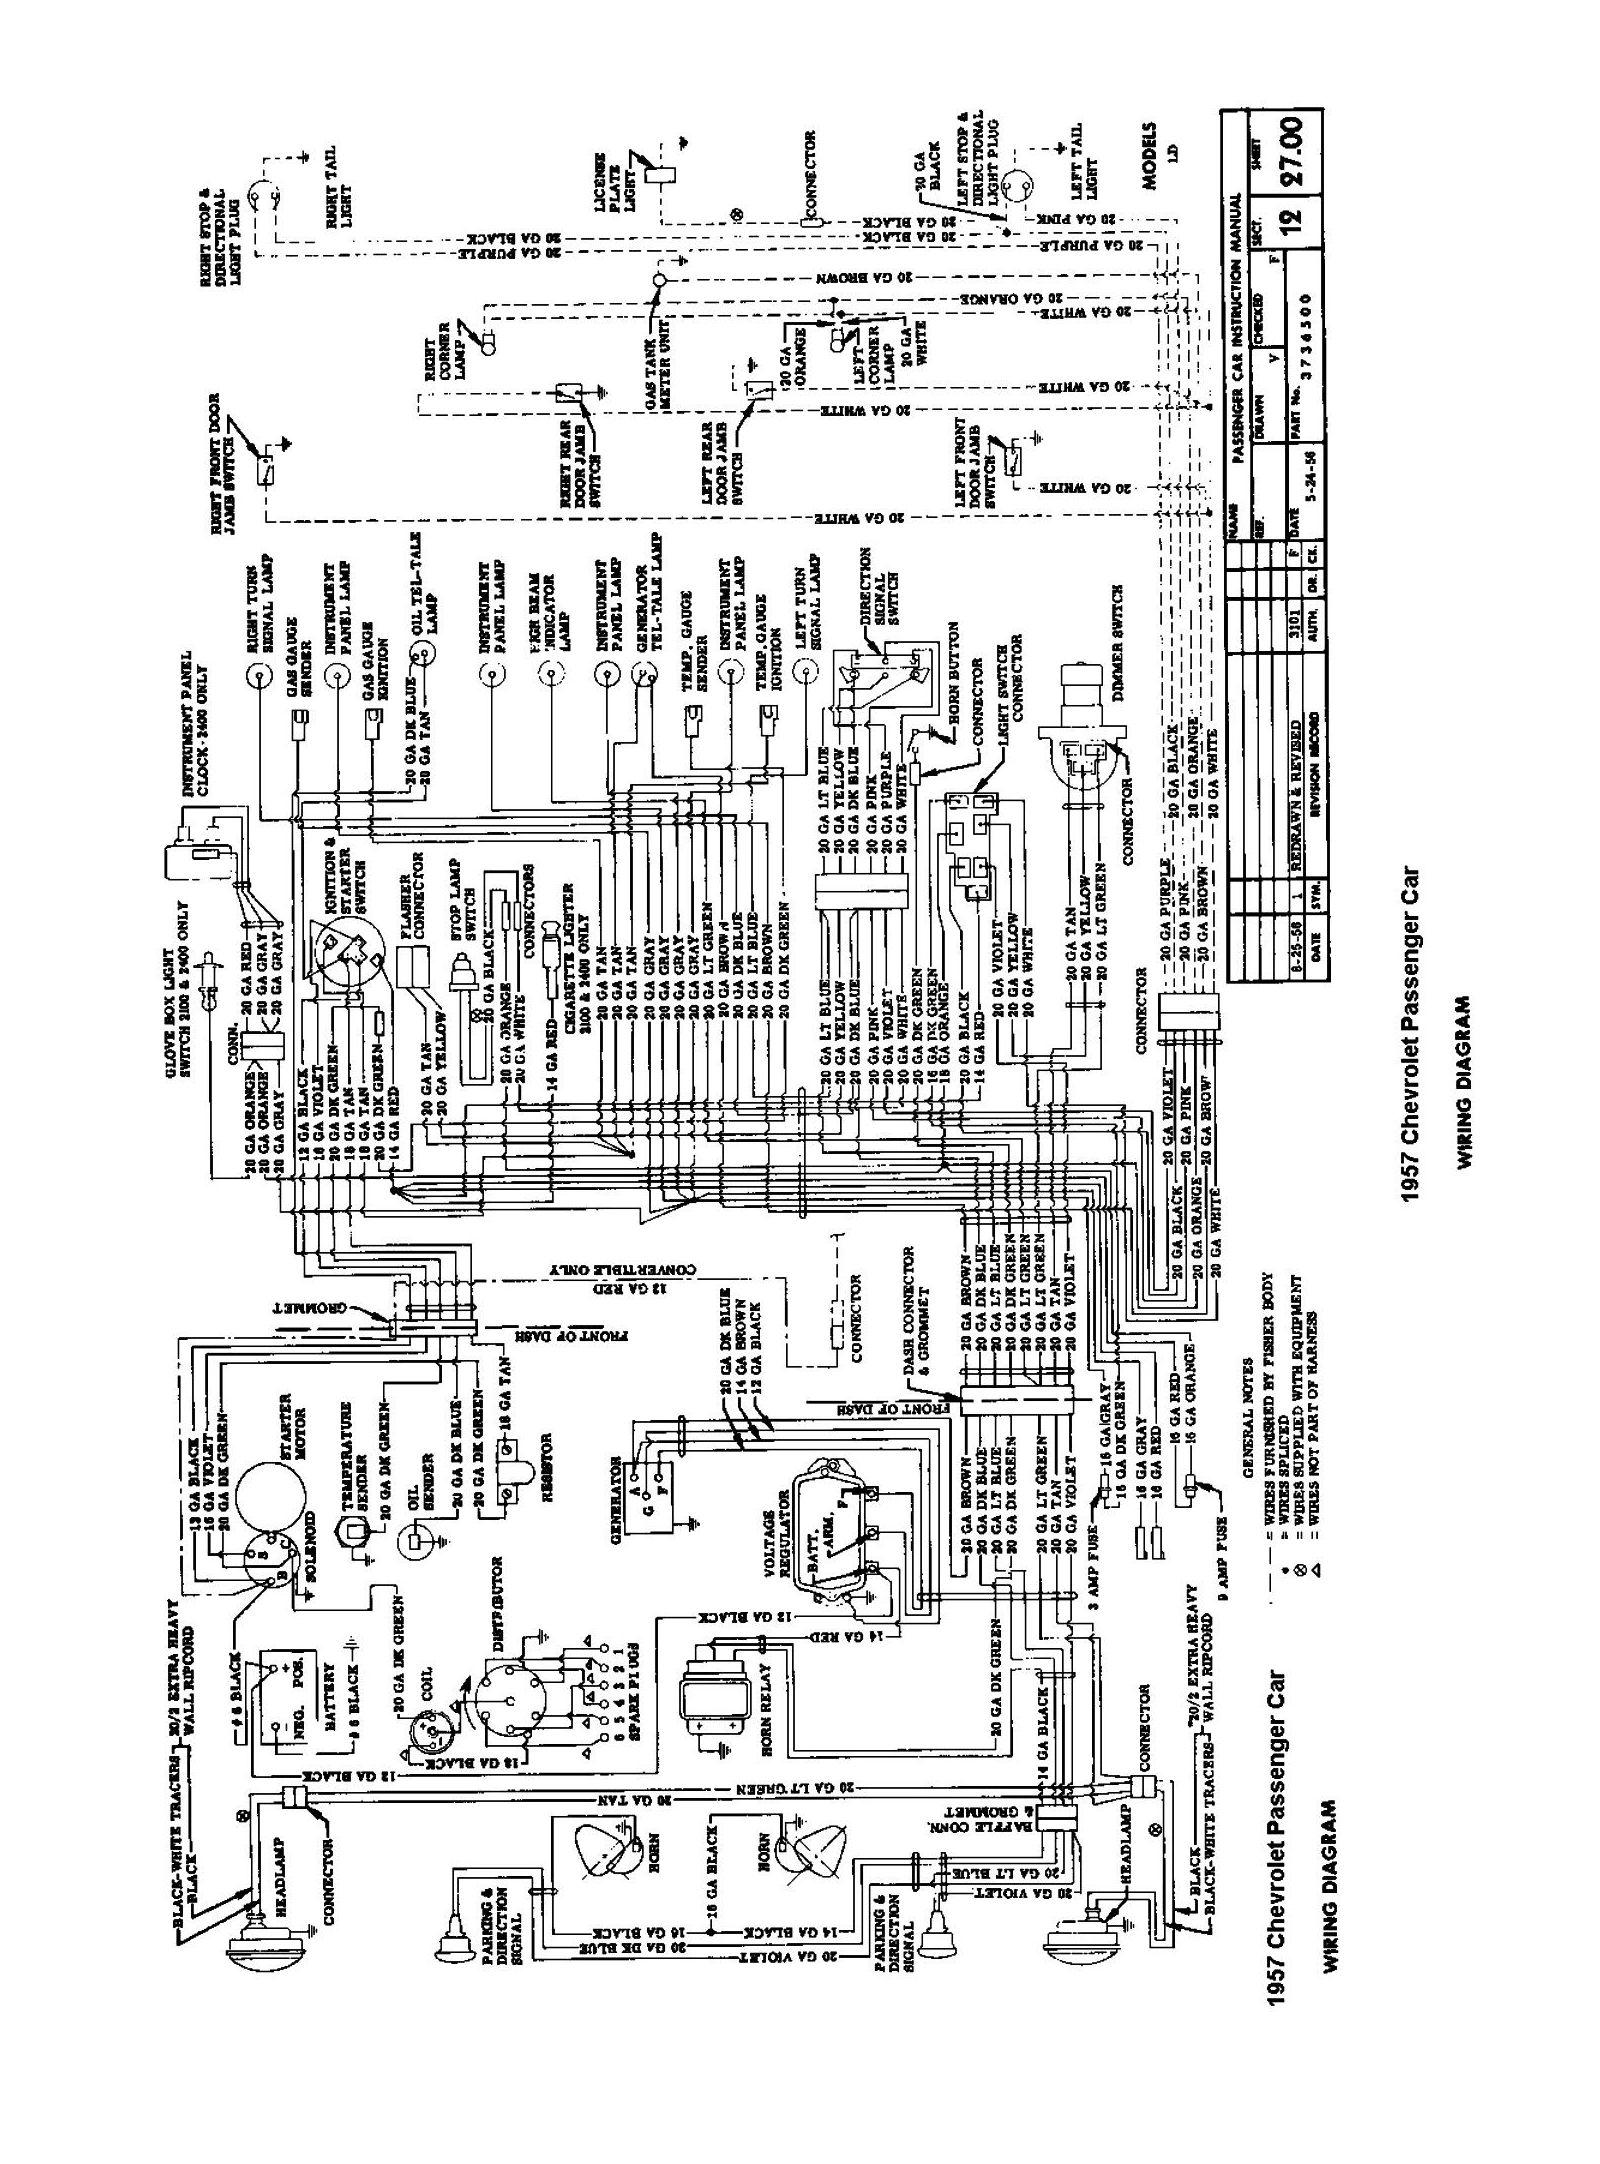 hight resolution of 1957 1957 car wiring diagrams 1957 passenger car wiring